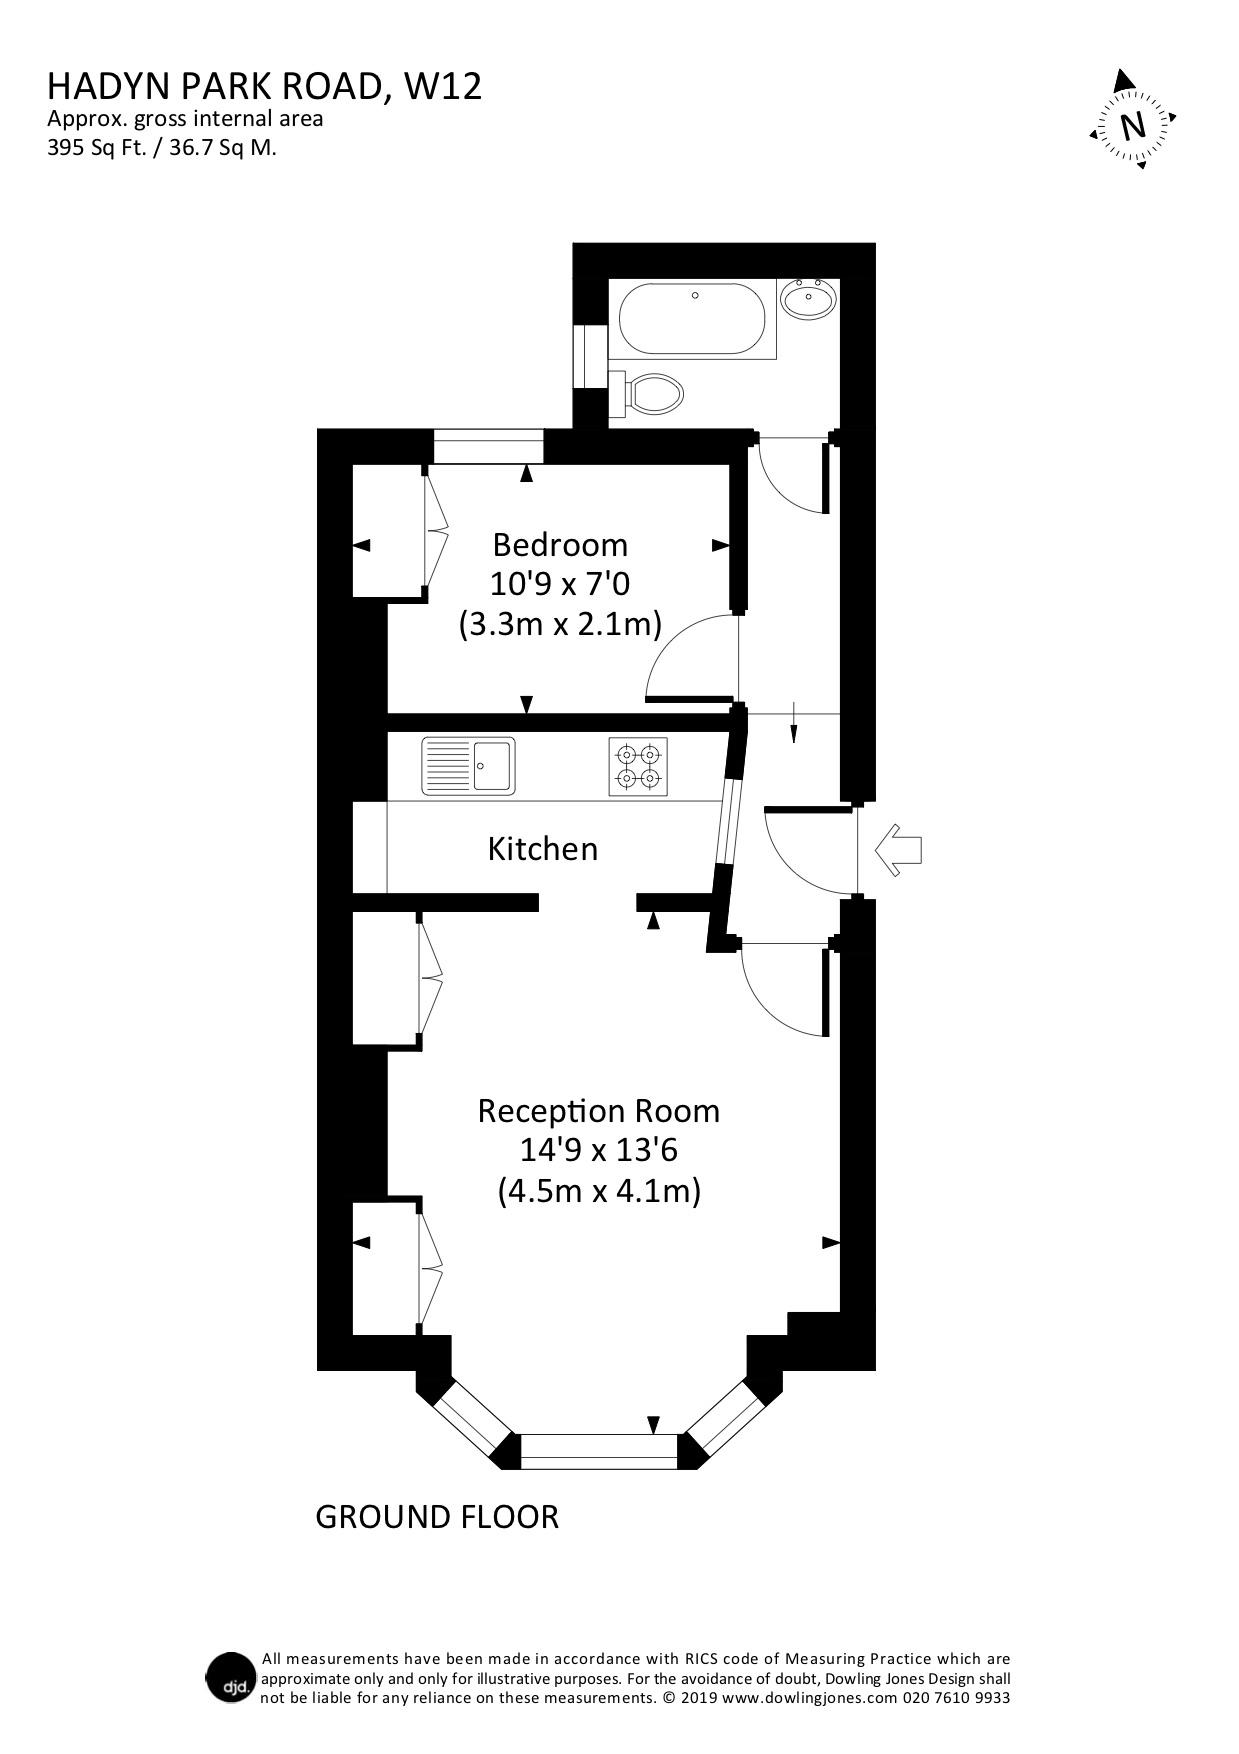 1 Bedroom Property For Sale In Hadyn Park Road Shepherds